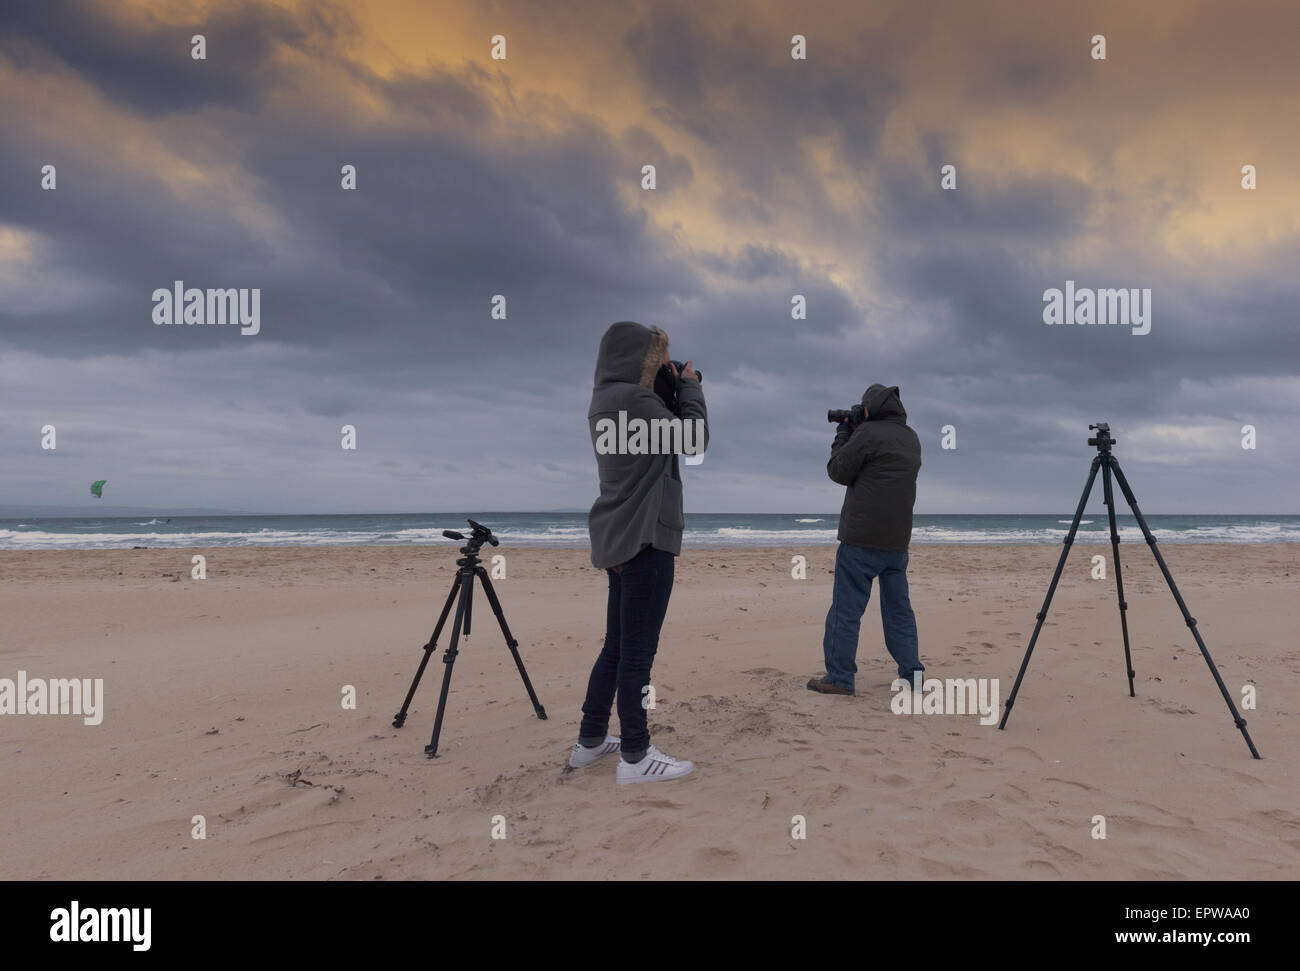 Photographers, Tarifa, Cadiz, Costa de la Luz, Andalusia, Spain. - Stock Image